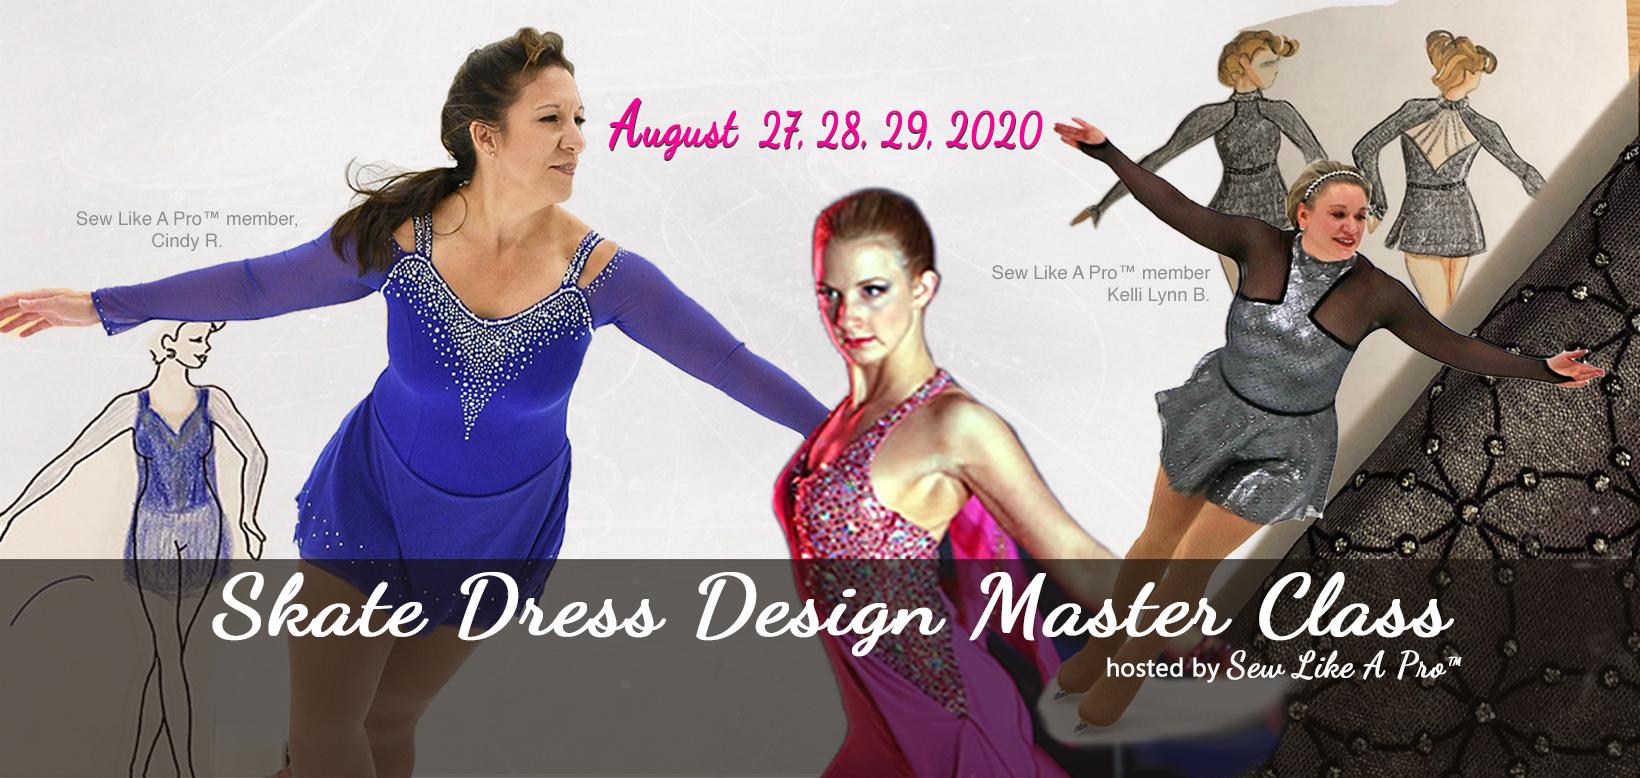 Free 3-Day Skate Dress Design Master Class